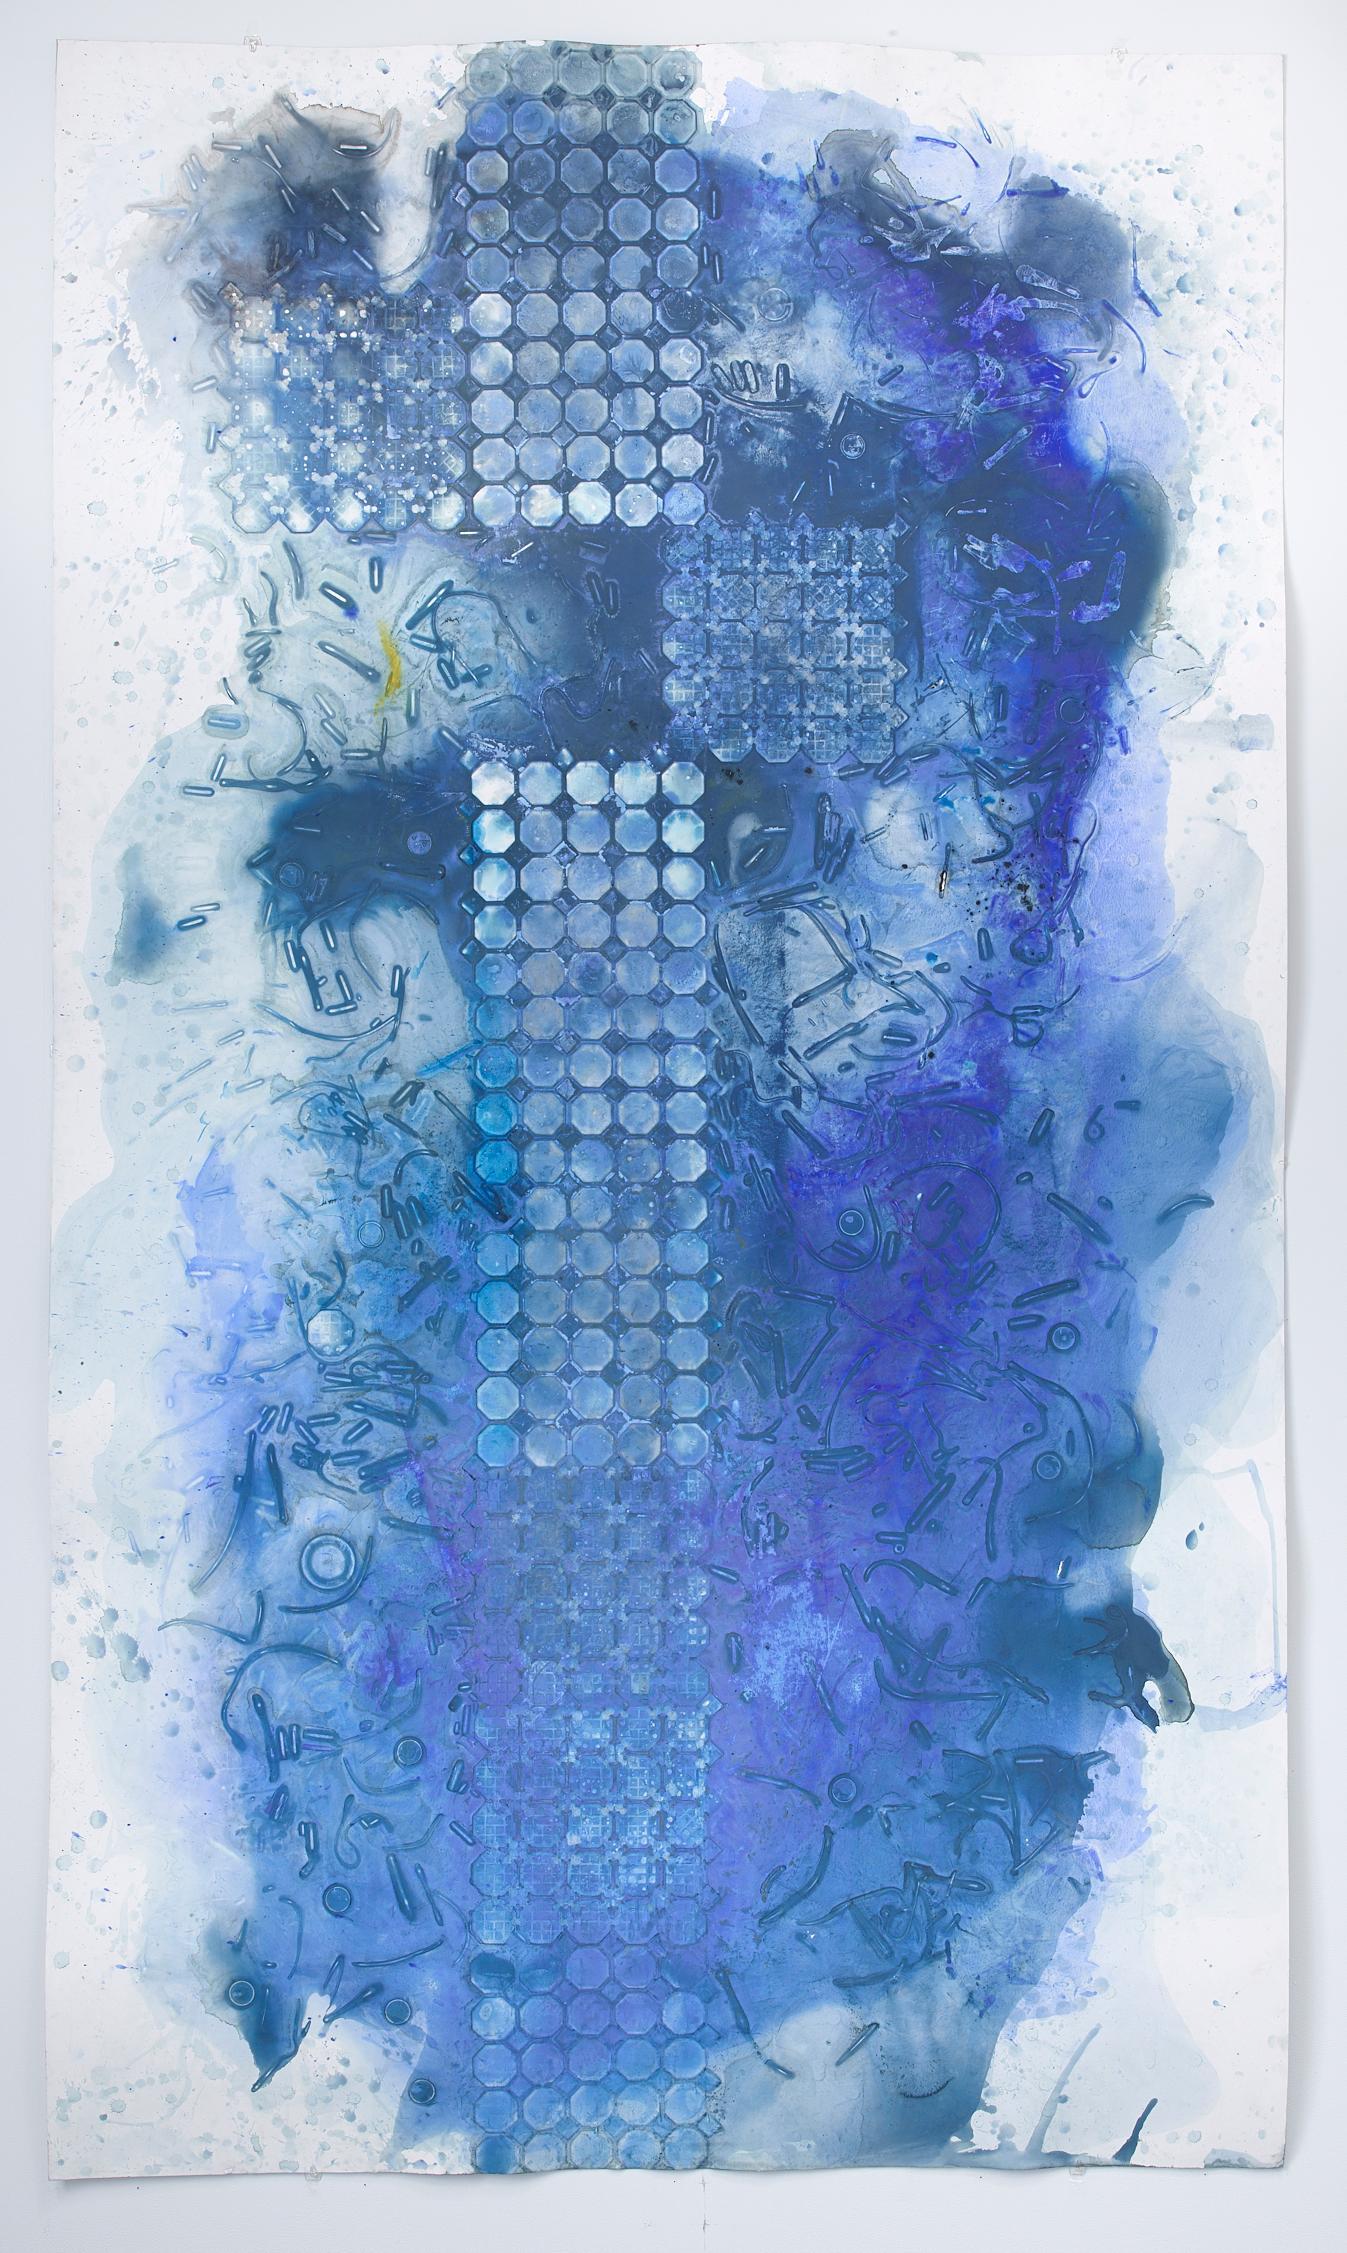 Ellen Hackl Fagan, Seeking the Sound of Cobalt Blue_Space Craft, 2017, Minimalis